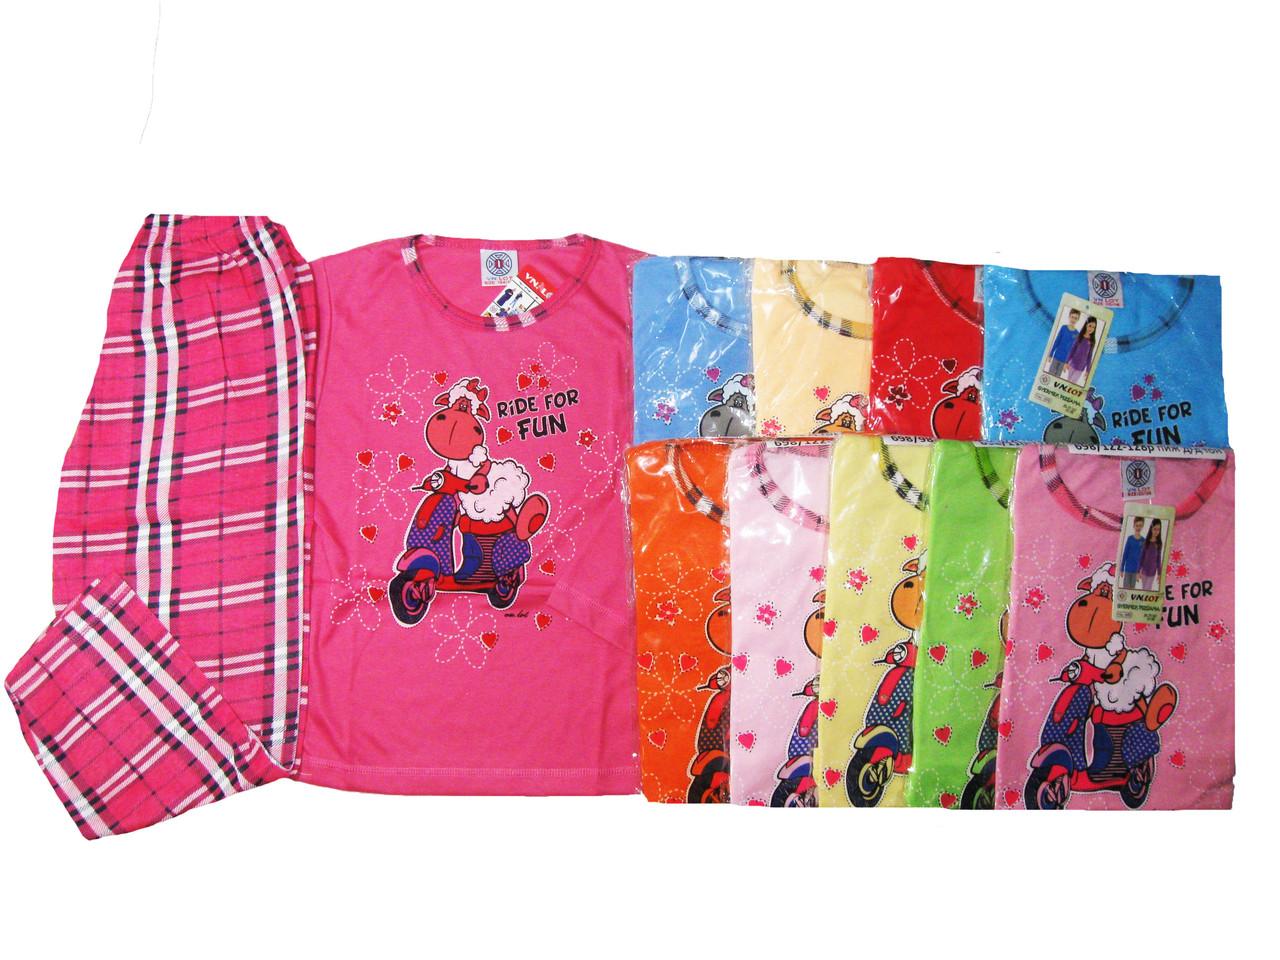 Пижама для девочек трикотажная, размеры  98/104-134/140, арт. 698